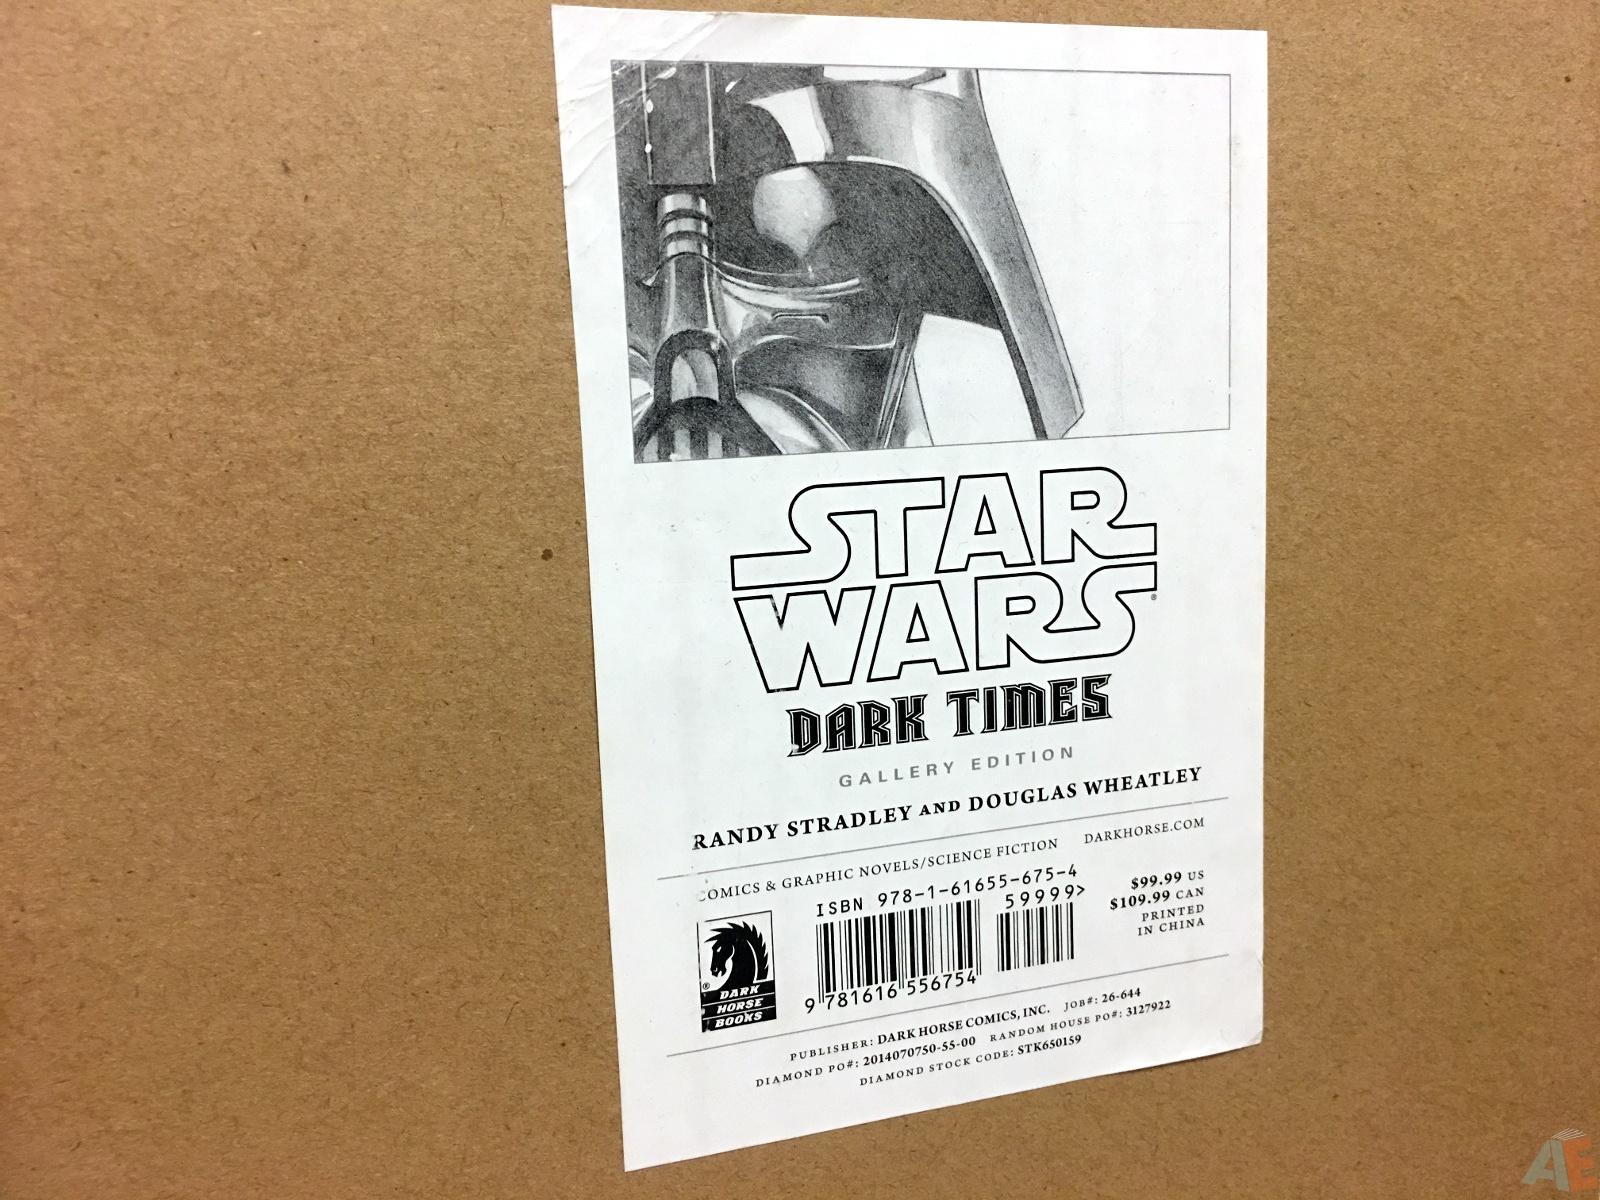 Star Wars: Dark Times Gallery Edition 46